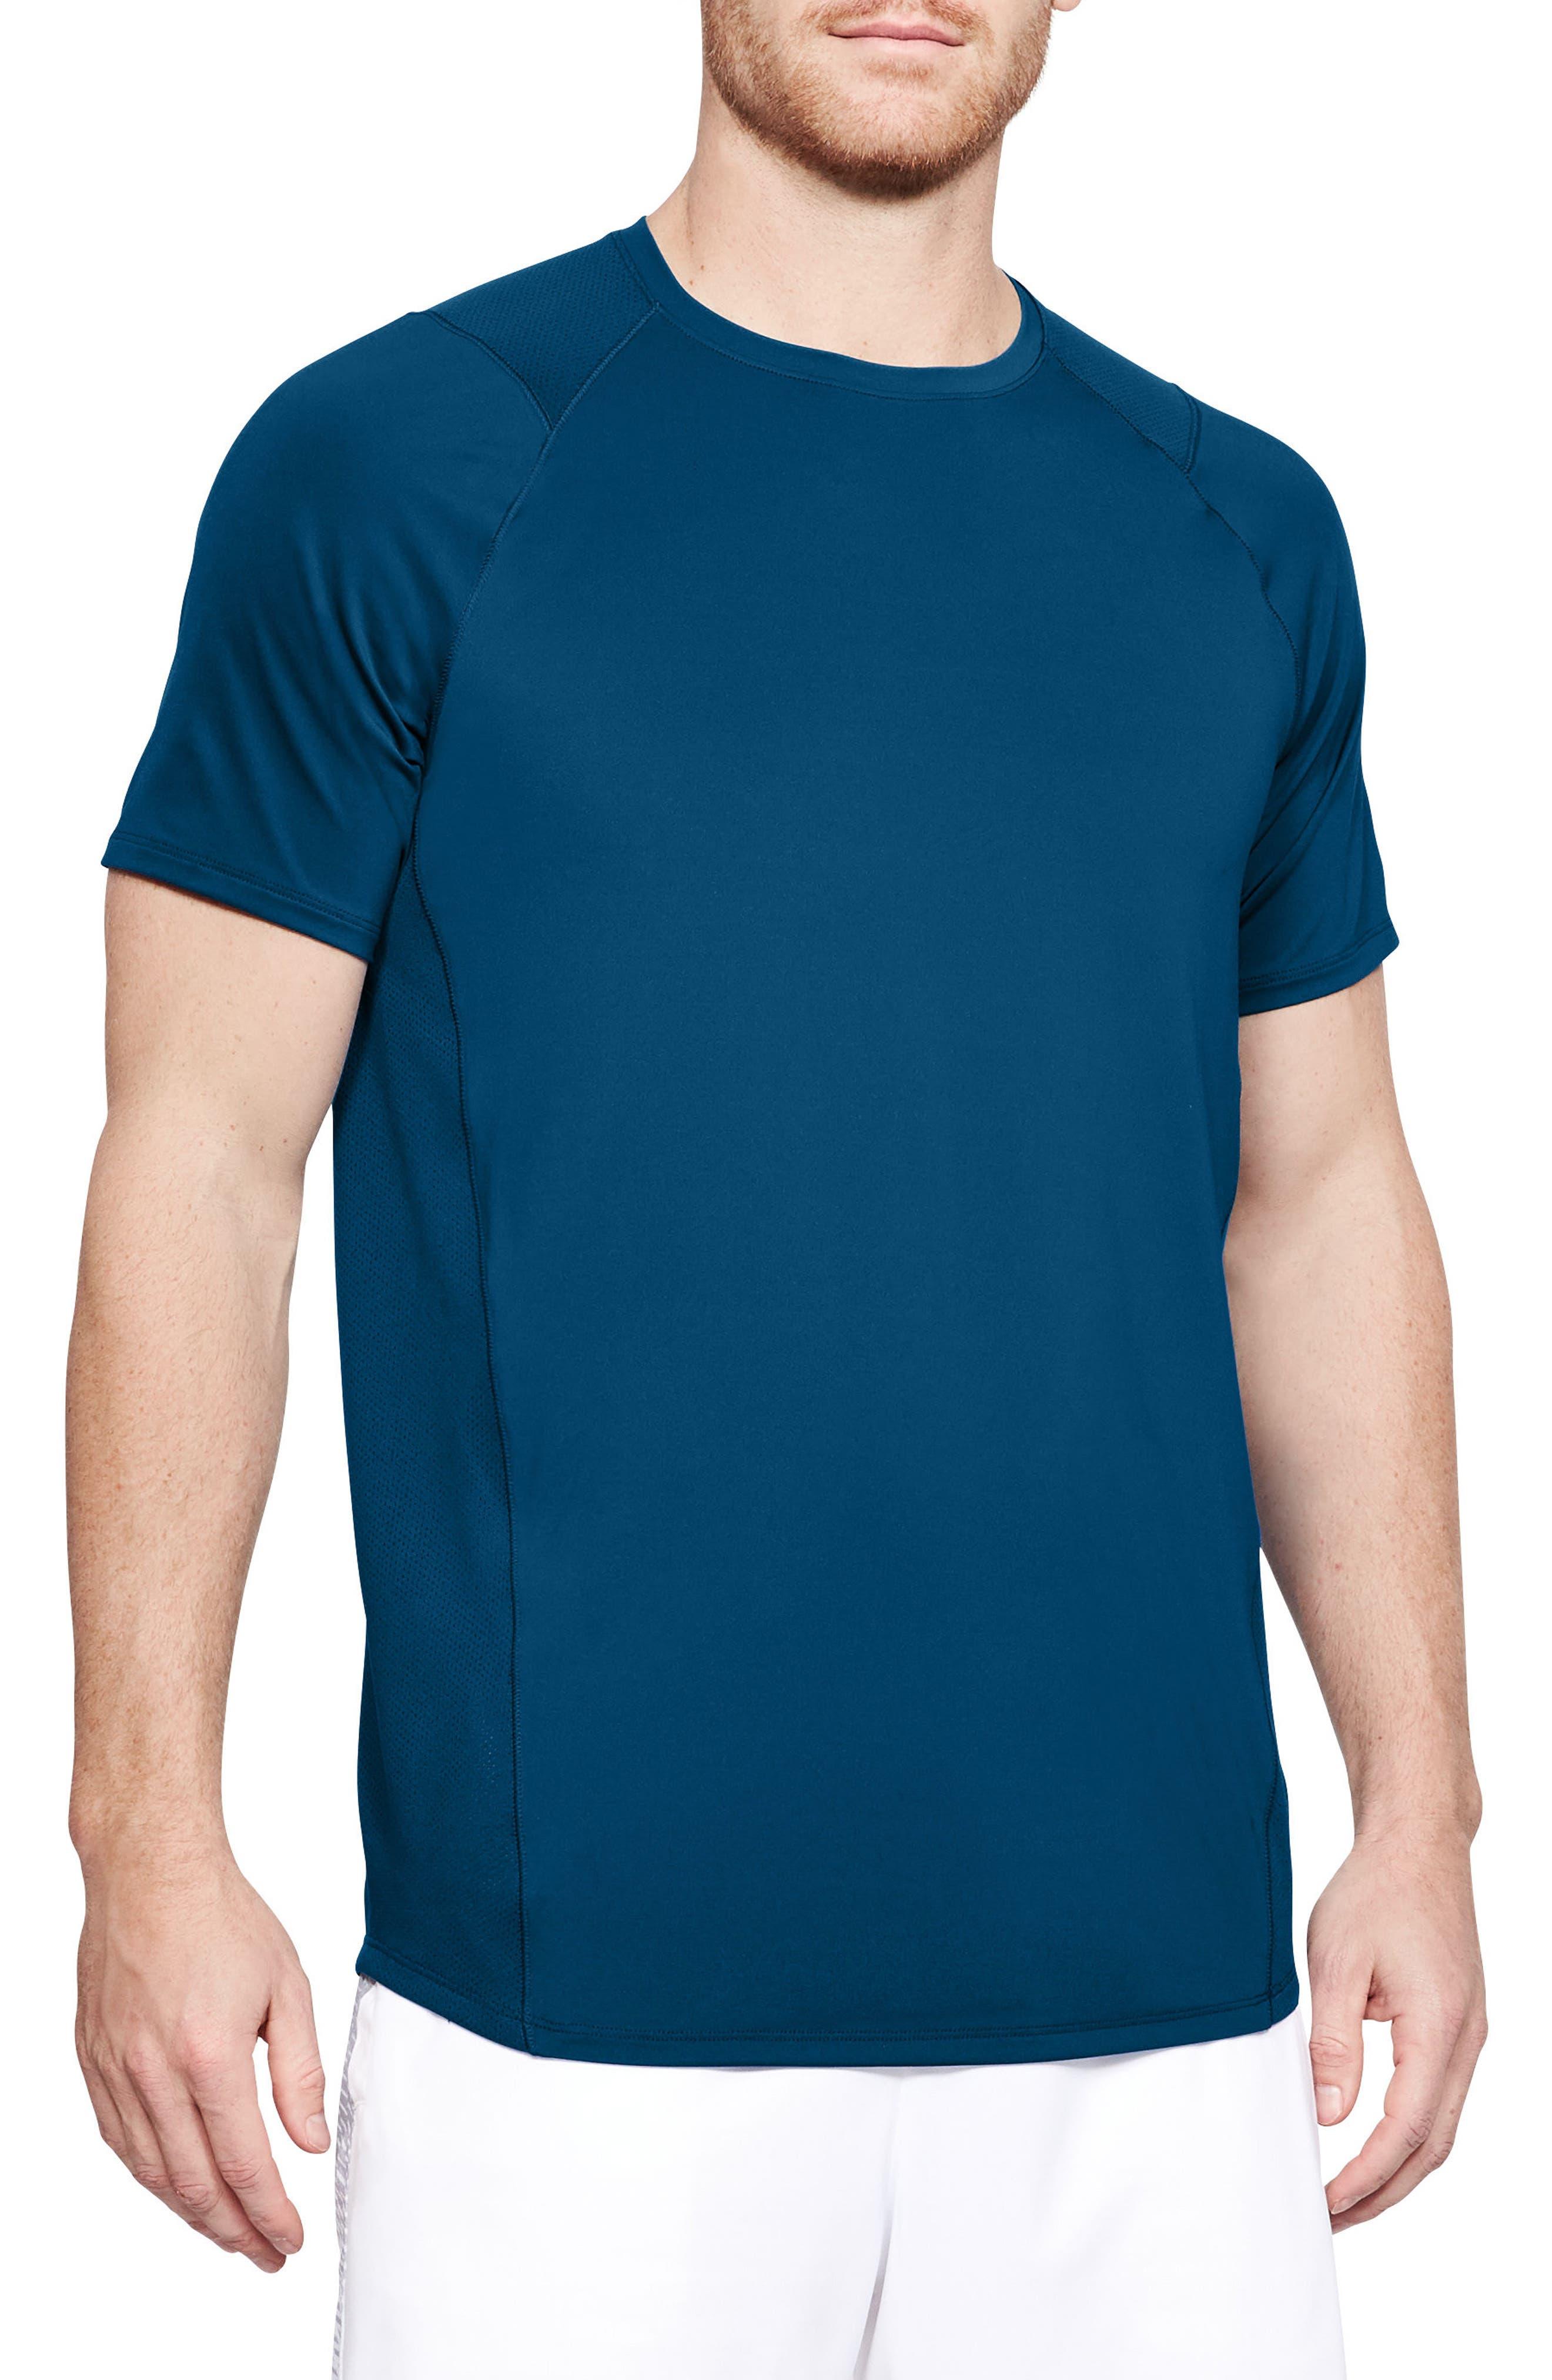 9bb67f51554 Under Armor Training T Shirts - Joe Maloy